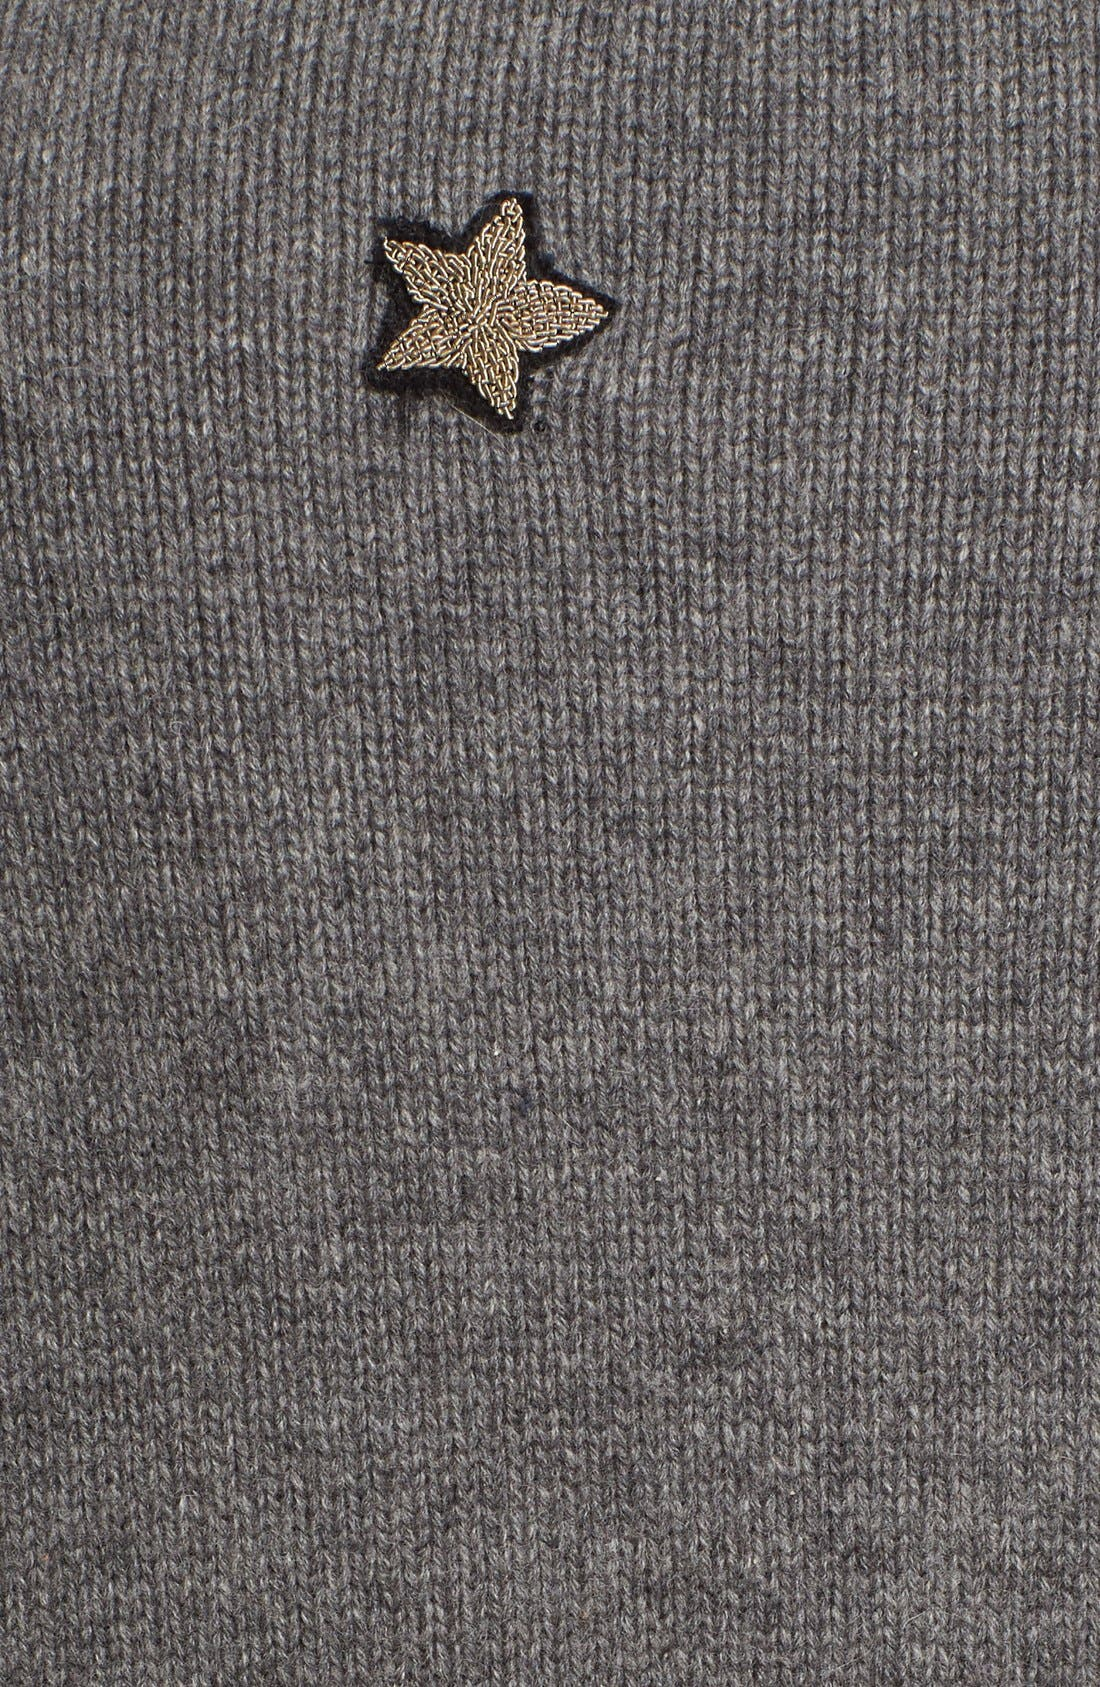 'Skye' Embellished Cardigan,                             Alternate thumbnail 6, color,                             Charcoal